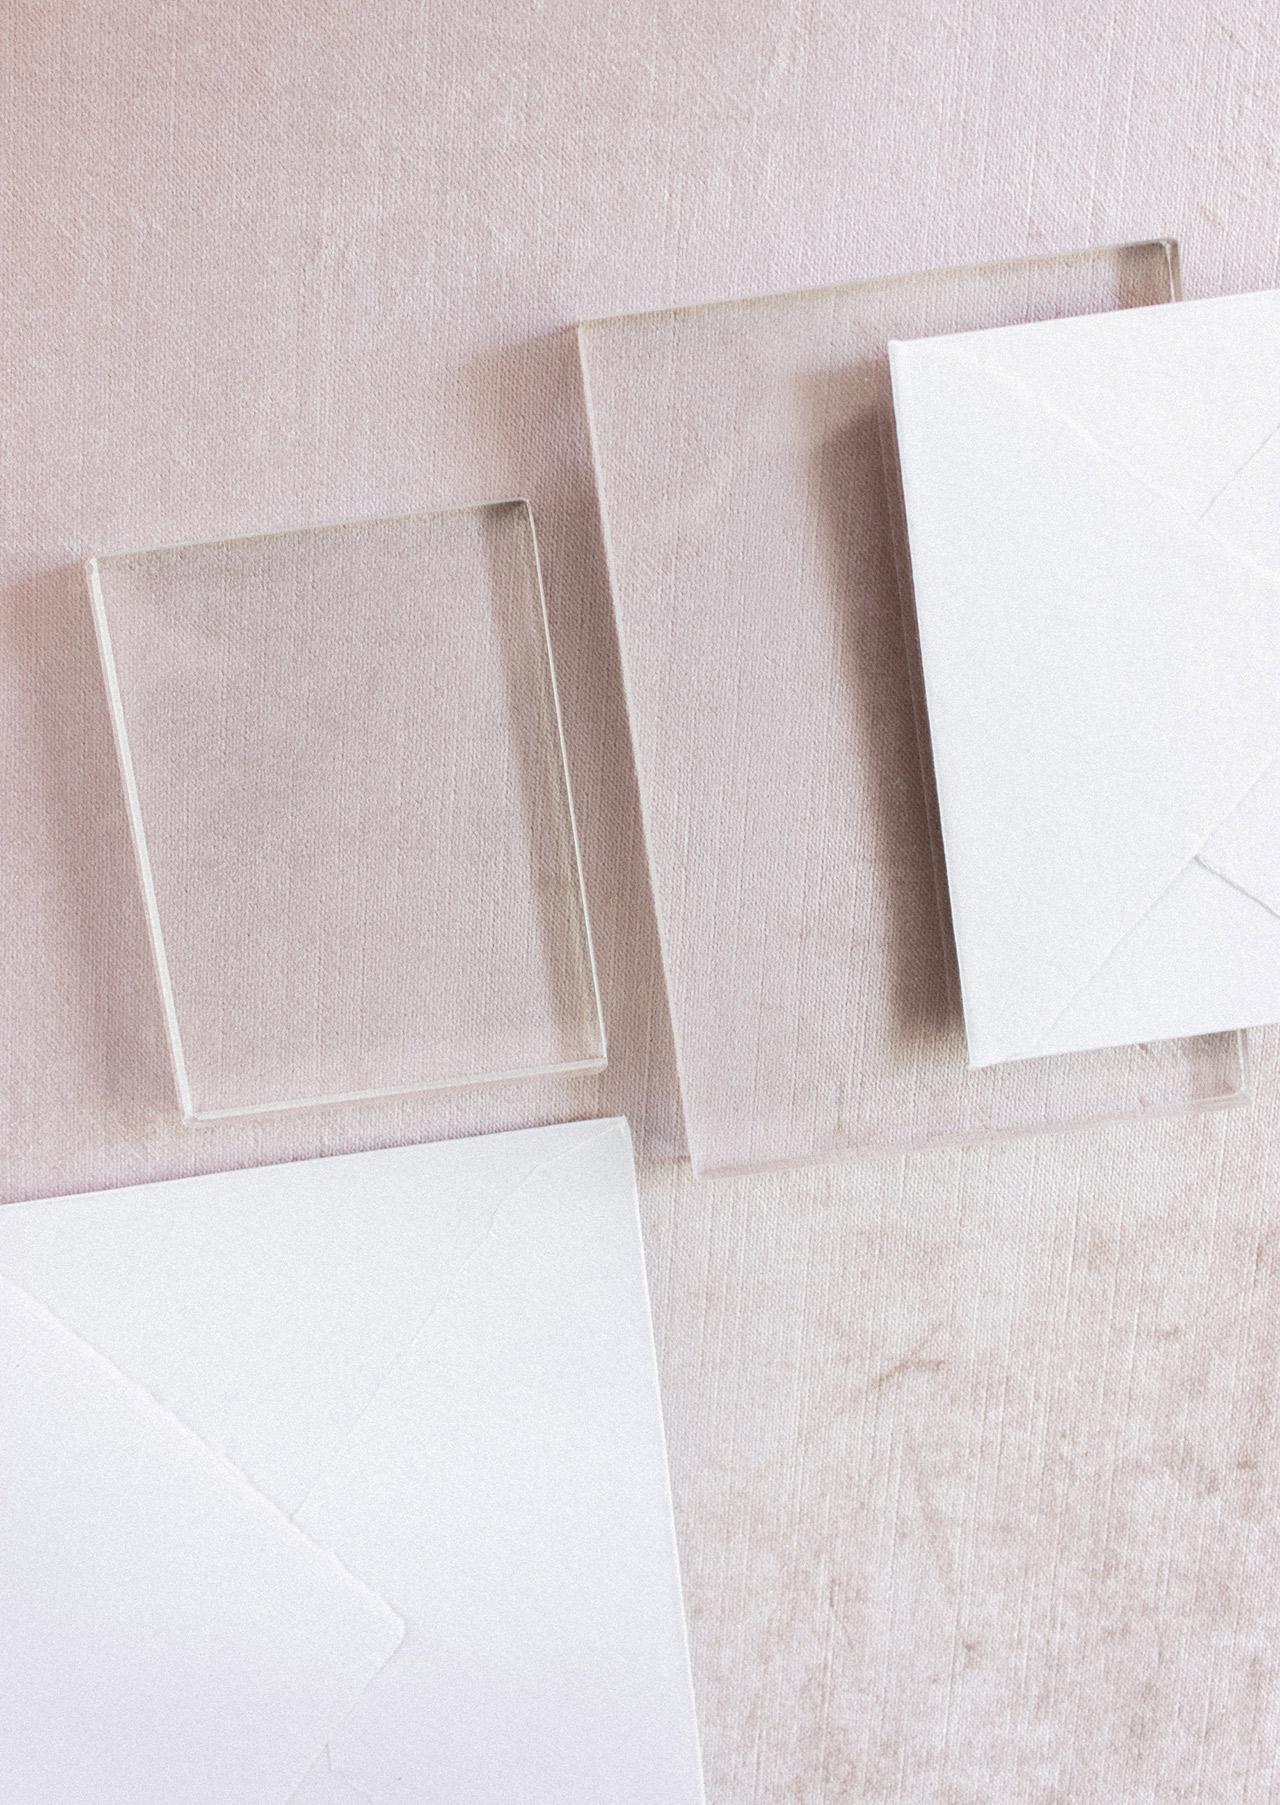 Wedding Photography Styling Blocks